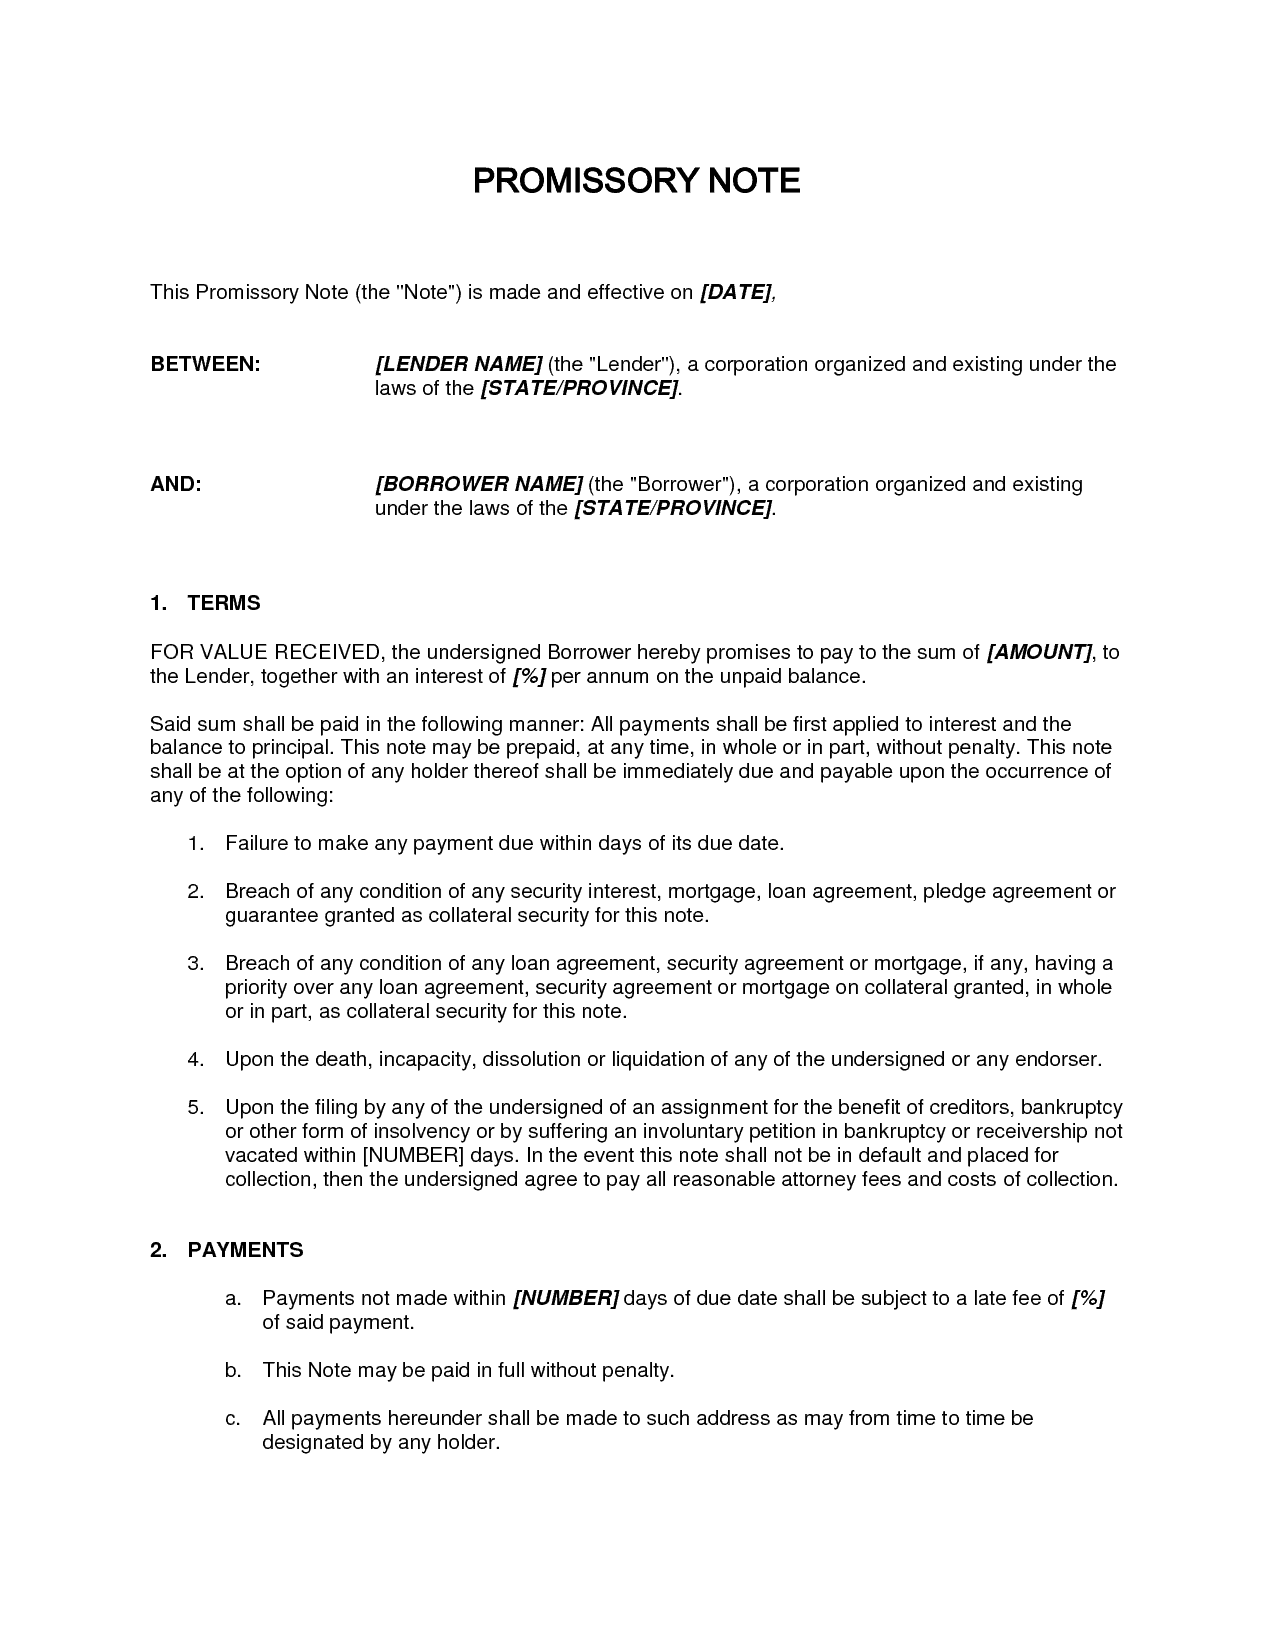 Promissory Note sample 14.41